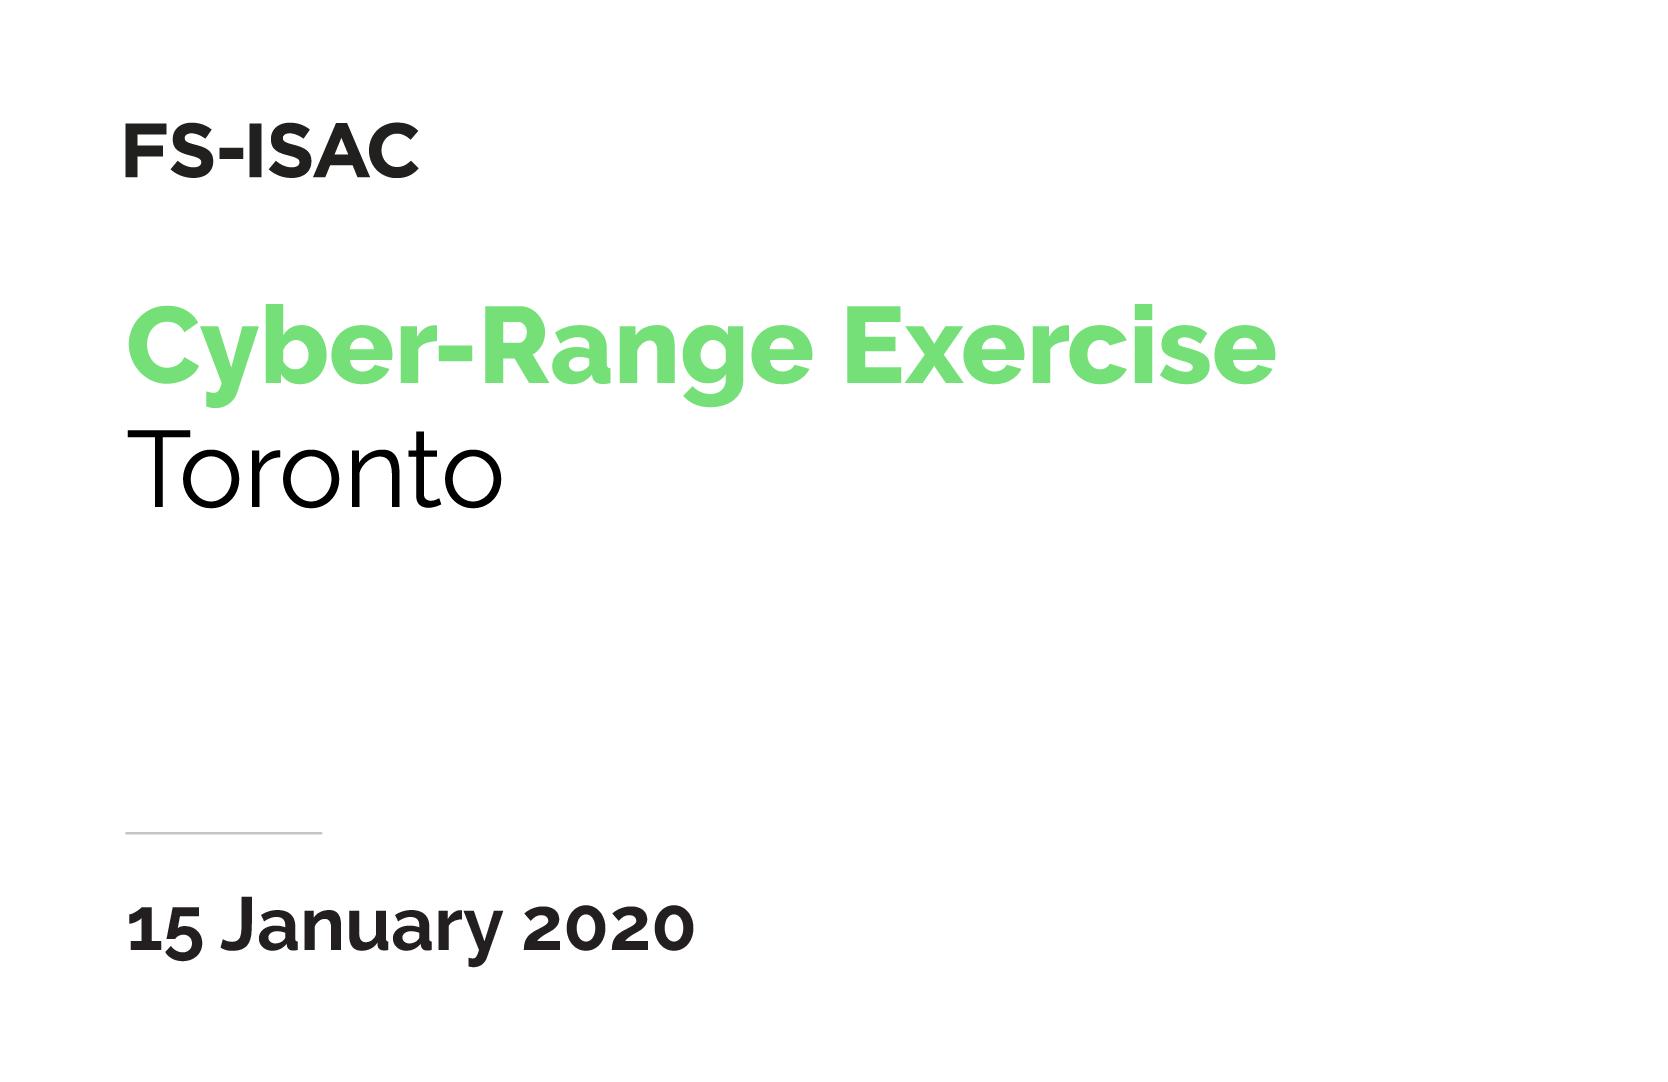 FS-ISAC Cyber-Range Exercise | Toronto